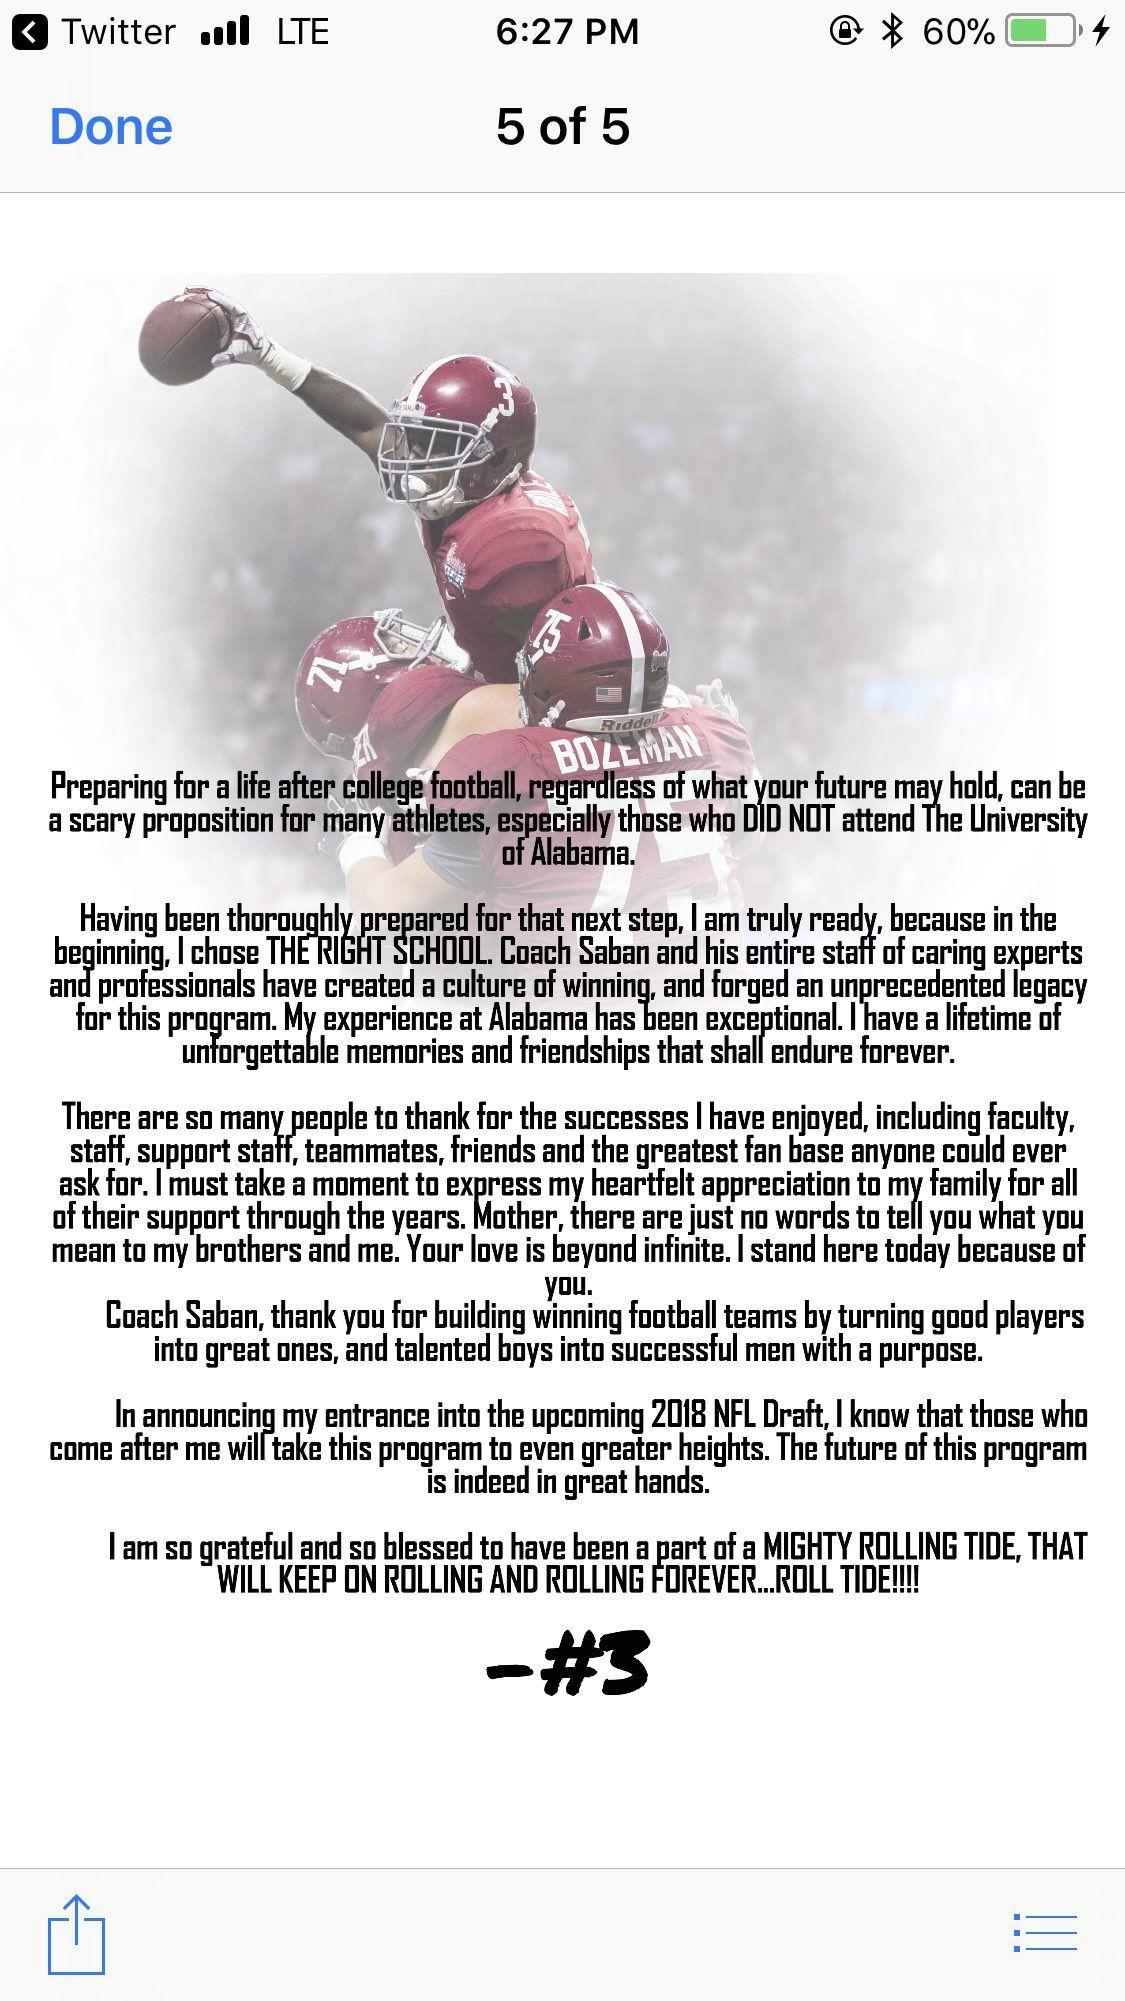 Calvin Ridley S Nfl Draft Announcement Will Make You Want To Commit To Alabama Nick Saban Alabama Crimson Tide Football Alabama Football Roll Tide Alabama